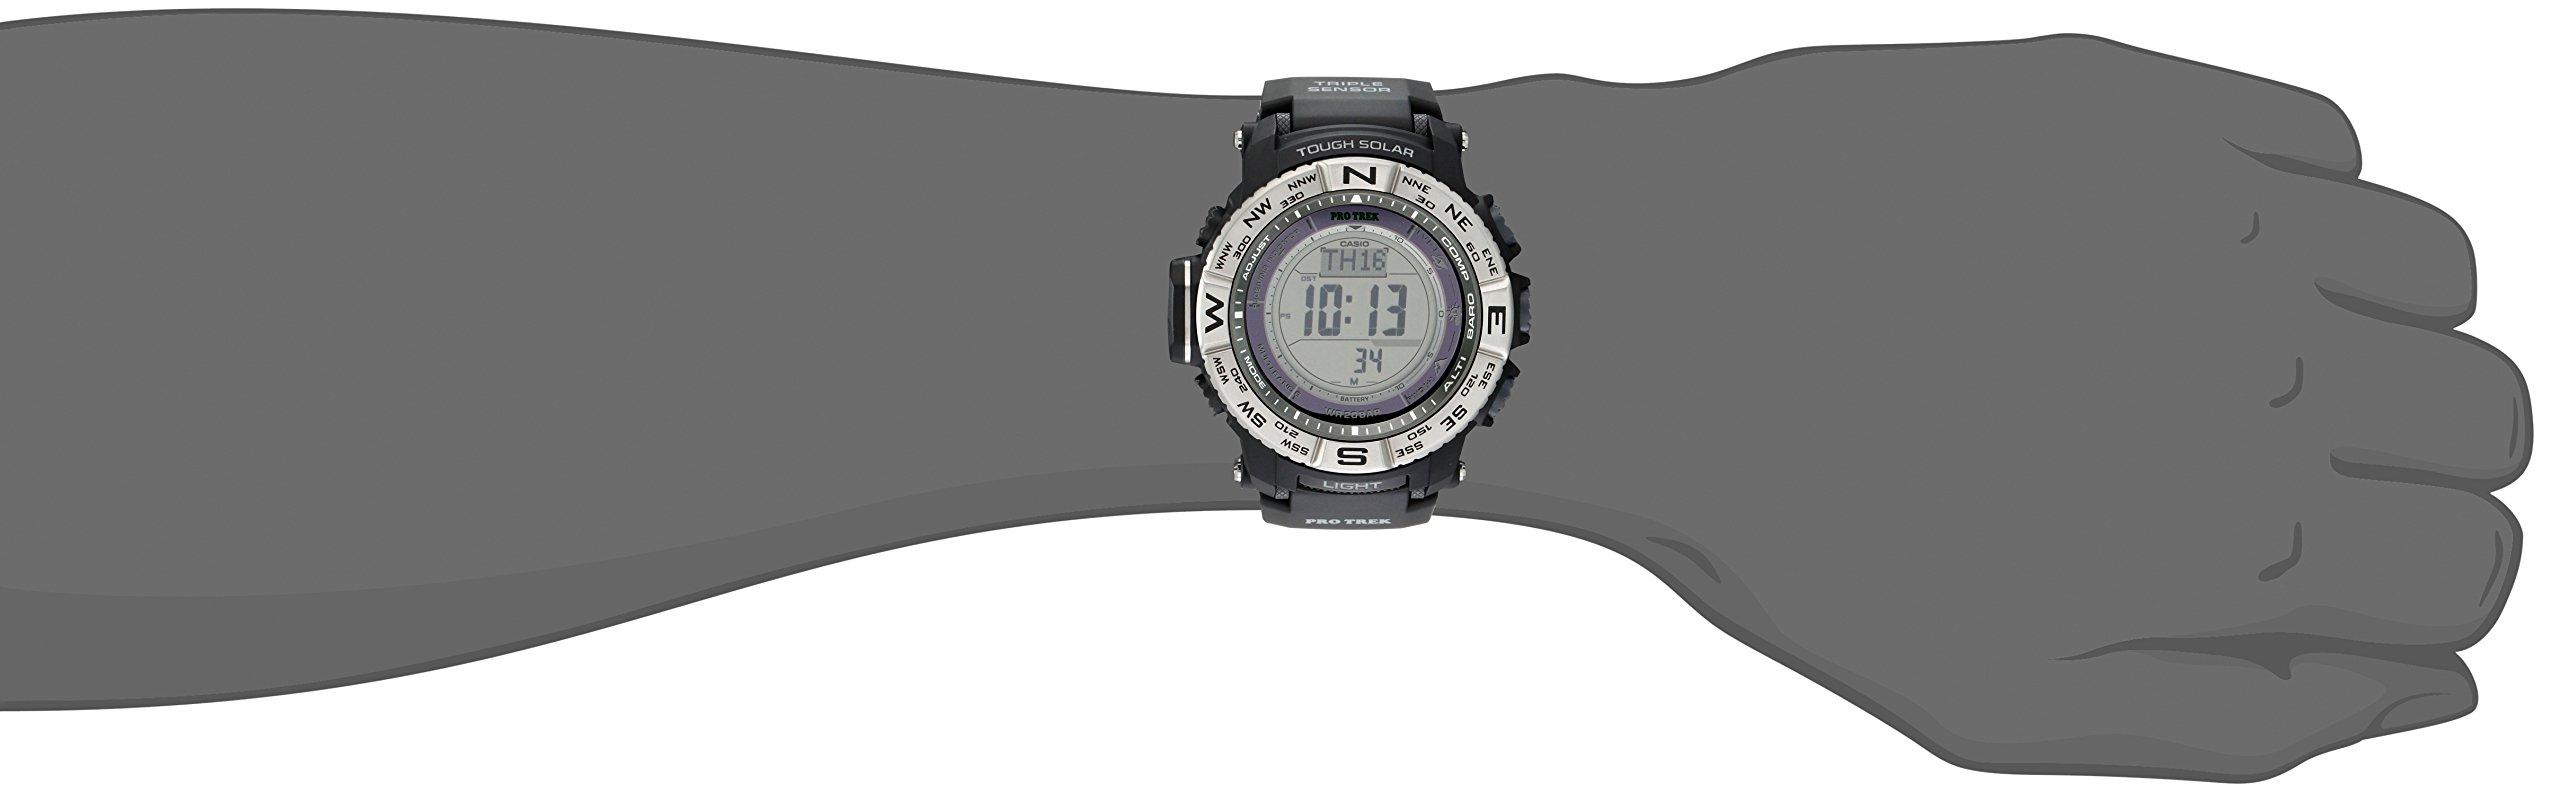 Casio Men's Pro Trek PRW-3500-1CR Solar Powered Atomic Resin Digital Watch by Casio (Image #3)